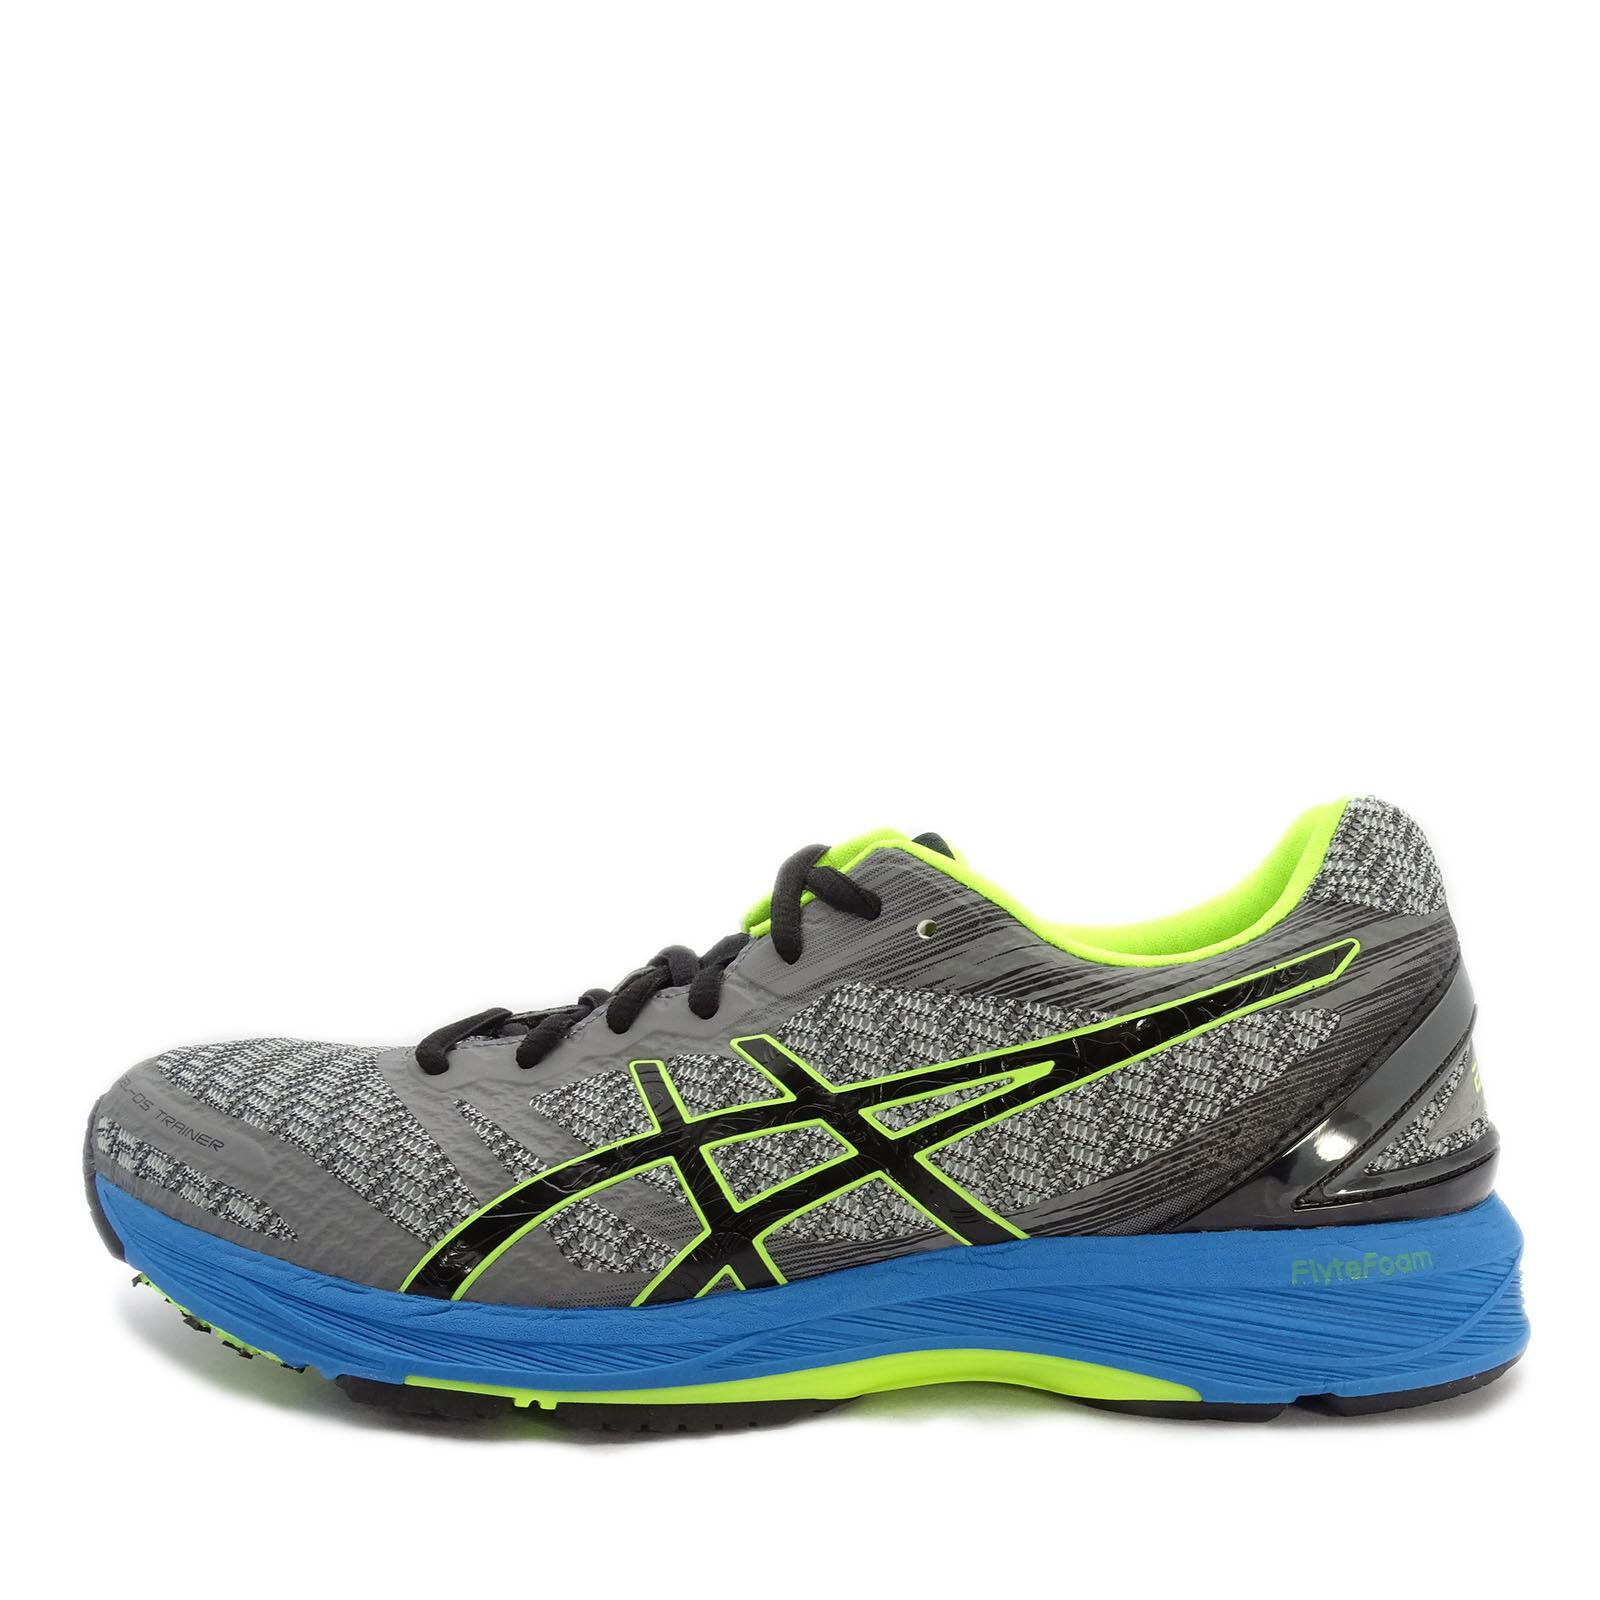 Asics GEL-DS Trainer 22 [T720N-9790] Men Training Shoes Carbon/Black-Volt